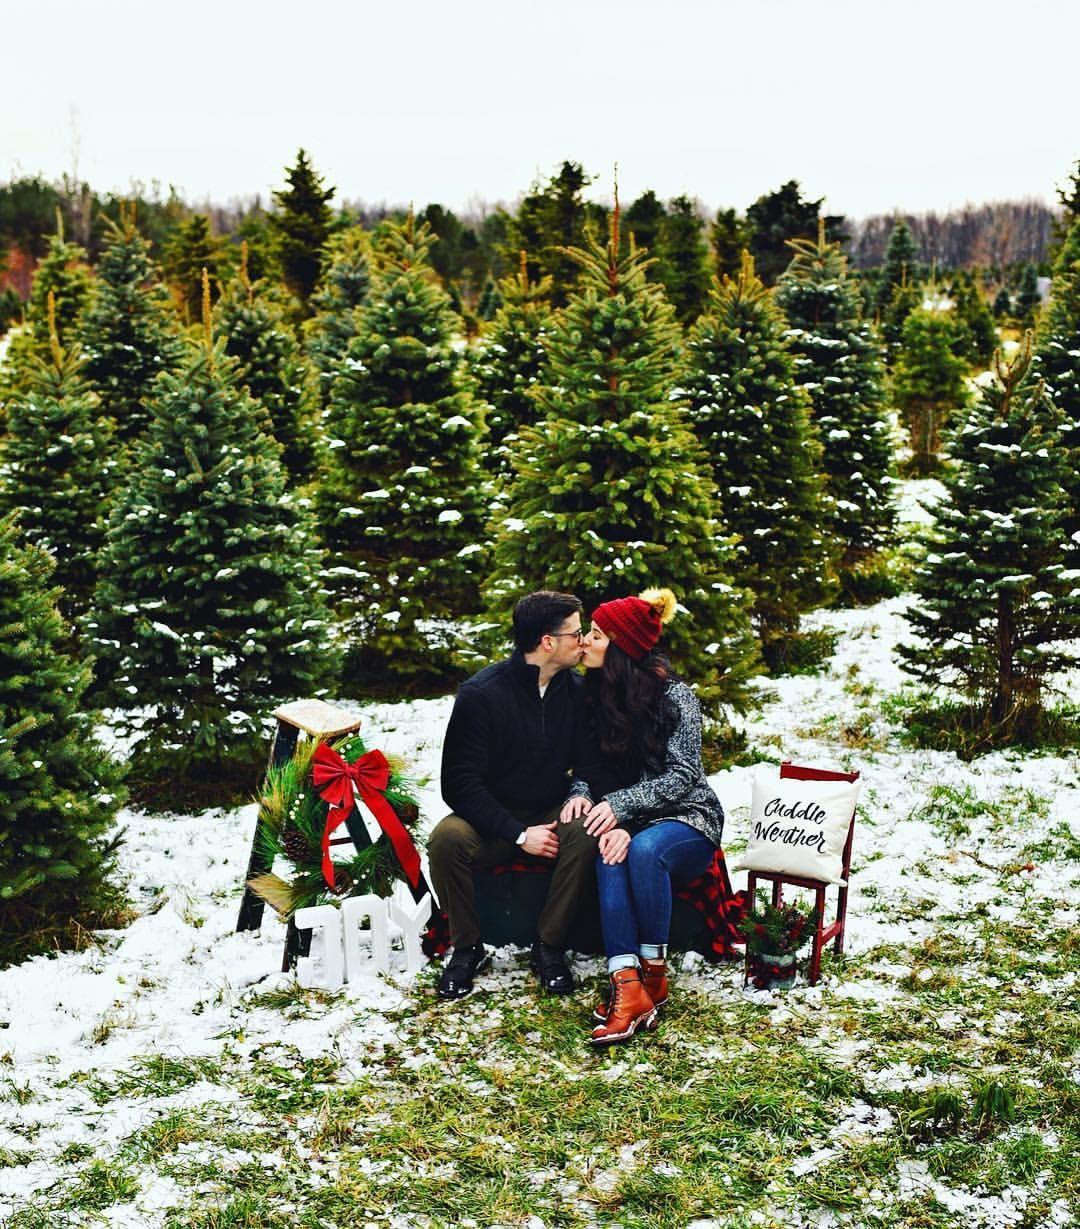 Christmas Tree Farm Photos Winter Photoshoot Christmas Decor Christmas Outfit Inspo Christmas Couple Photos Tree Farm Photo Shoot Holiday Photoshoot